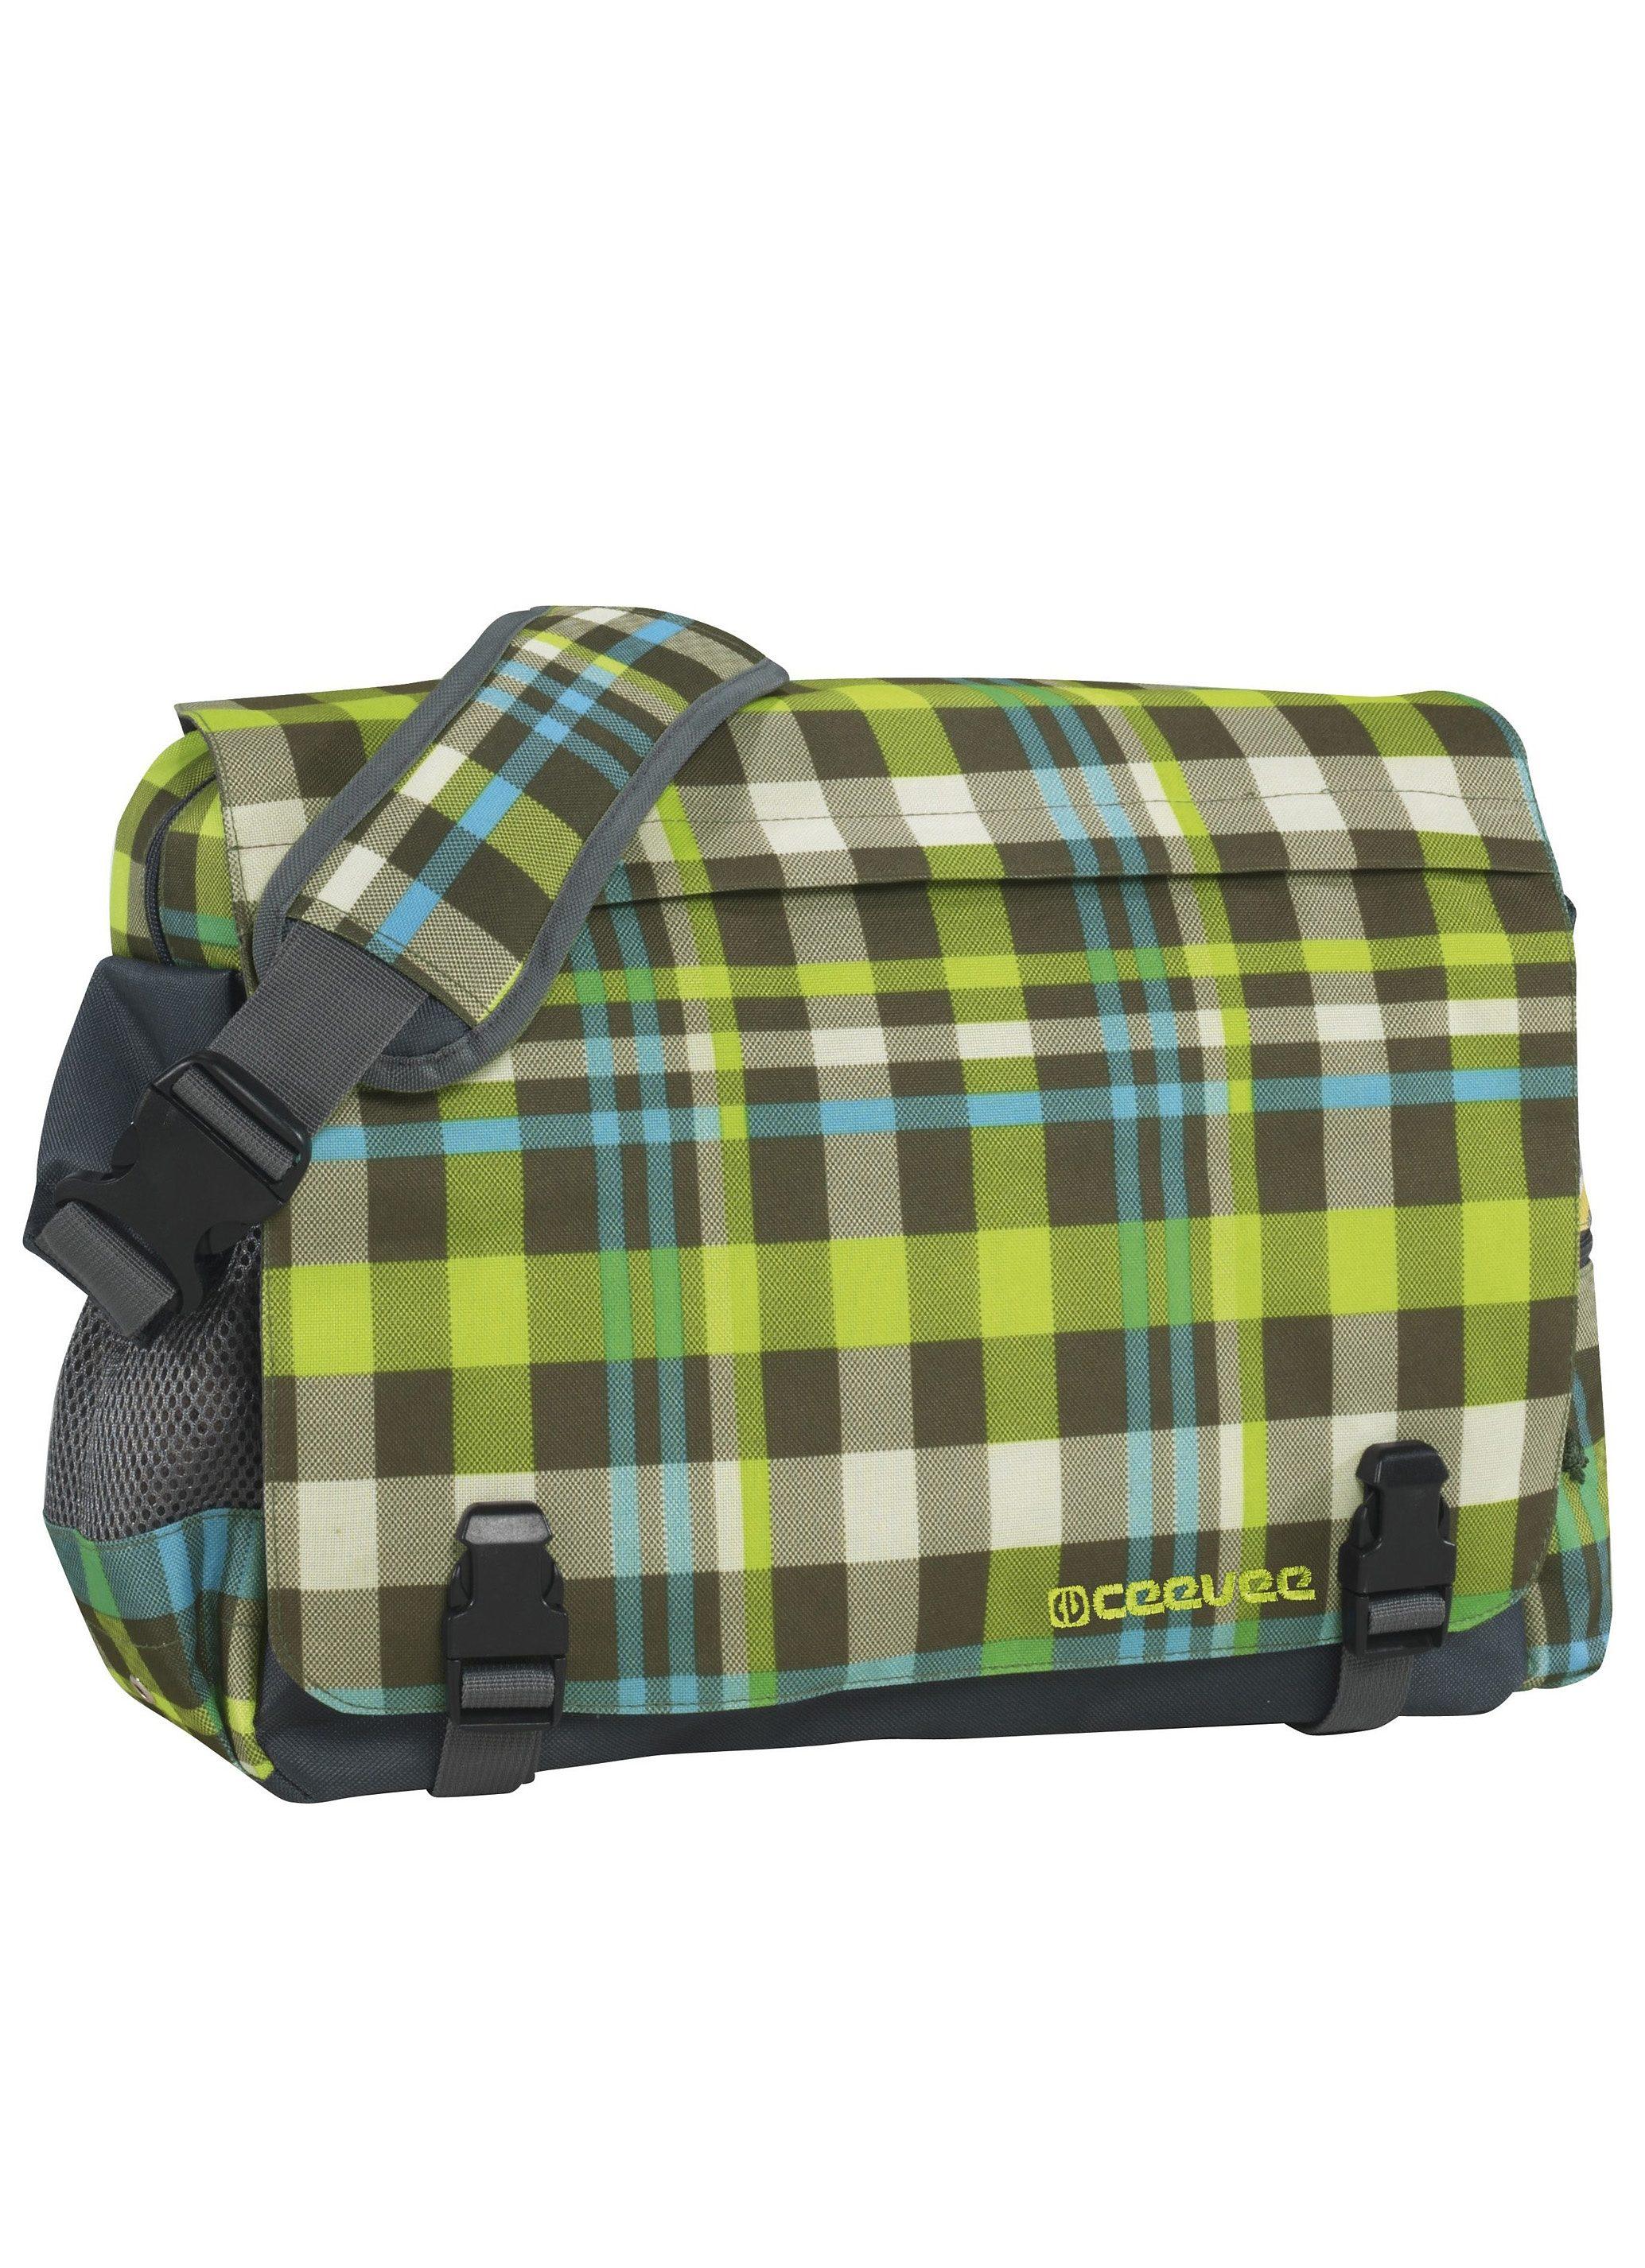 ceevee® Messenger Bag, »Manchester caro green«